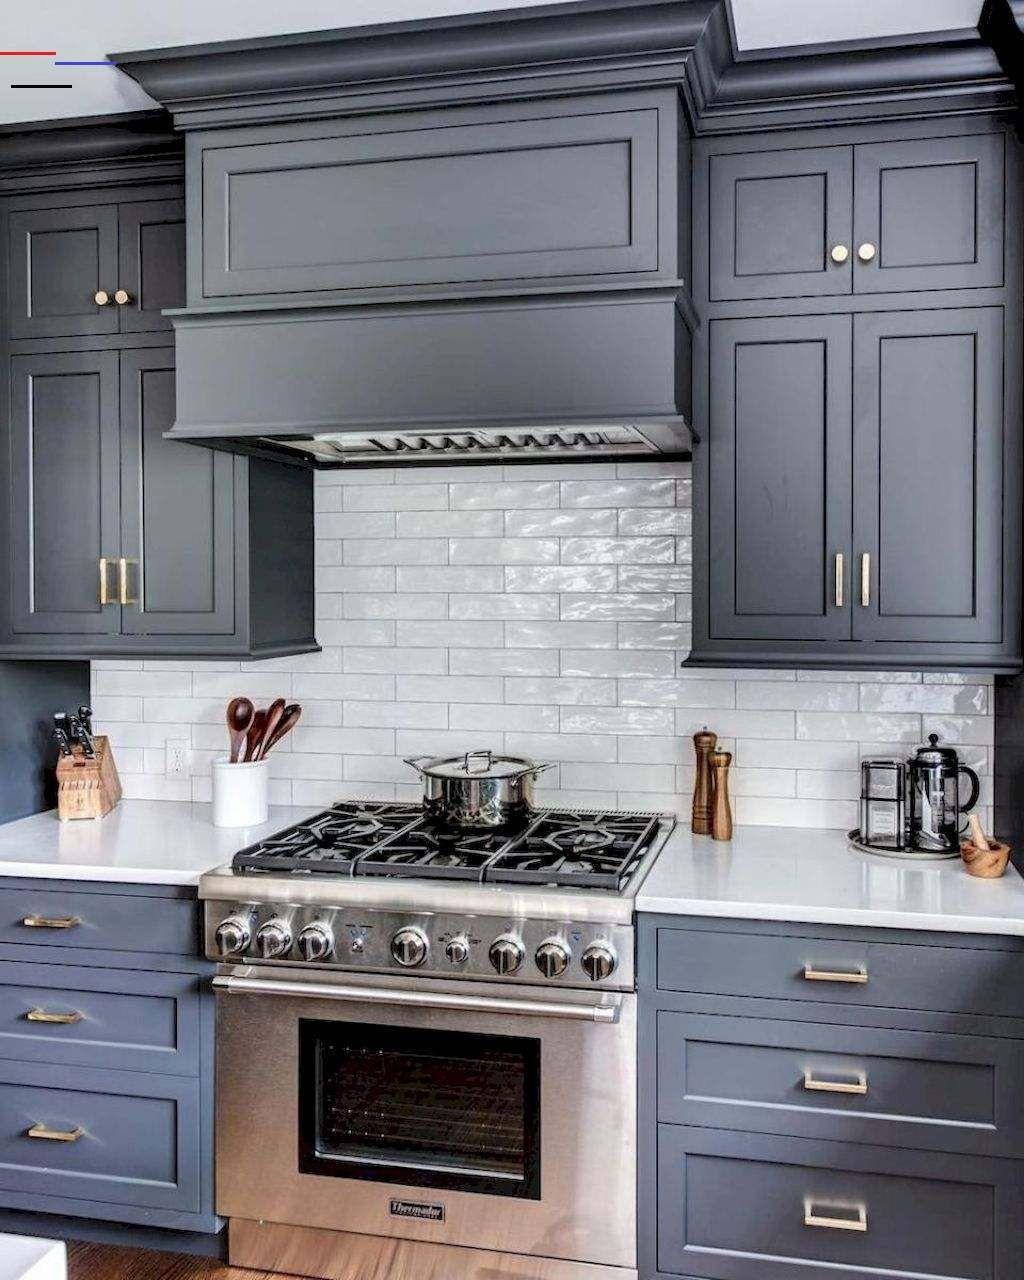 42 Modern Farmhouse Kitchen Cabinet Makeover Design Ideas Modernfarmhousekitchens Not All Ki In 2020 Blaue Kuchenschranke Innenarchitektur Kuche Kuchenrenovierung